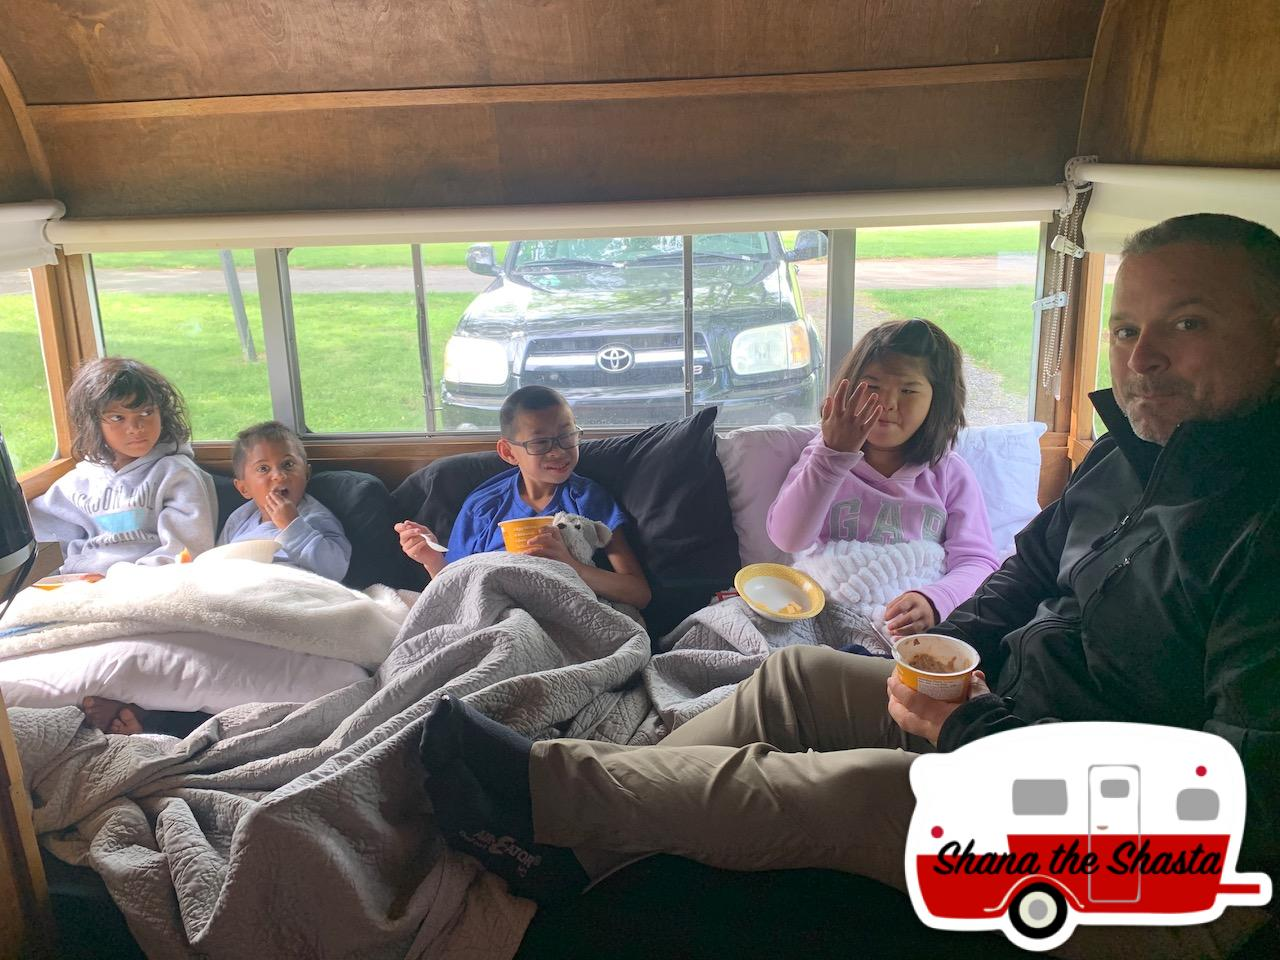 Family-Breakfast-Vintage-Camper